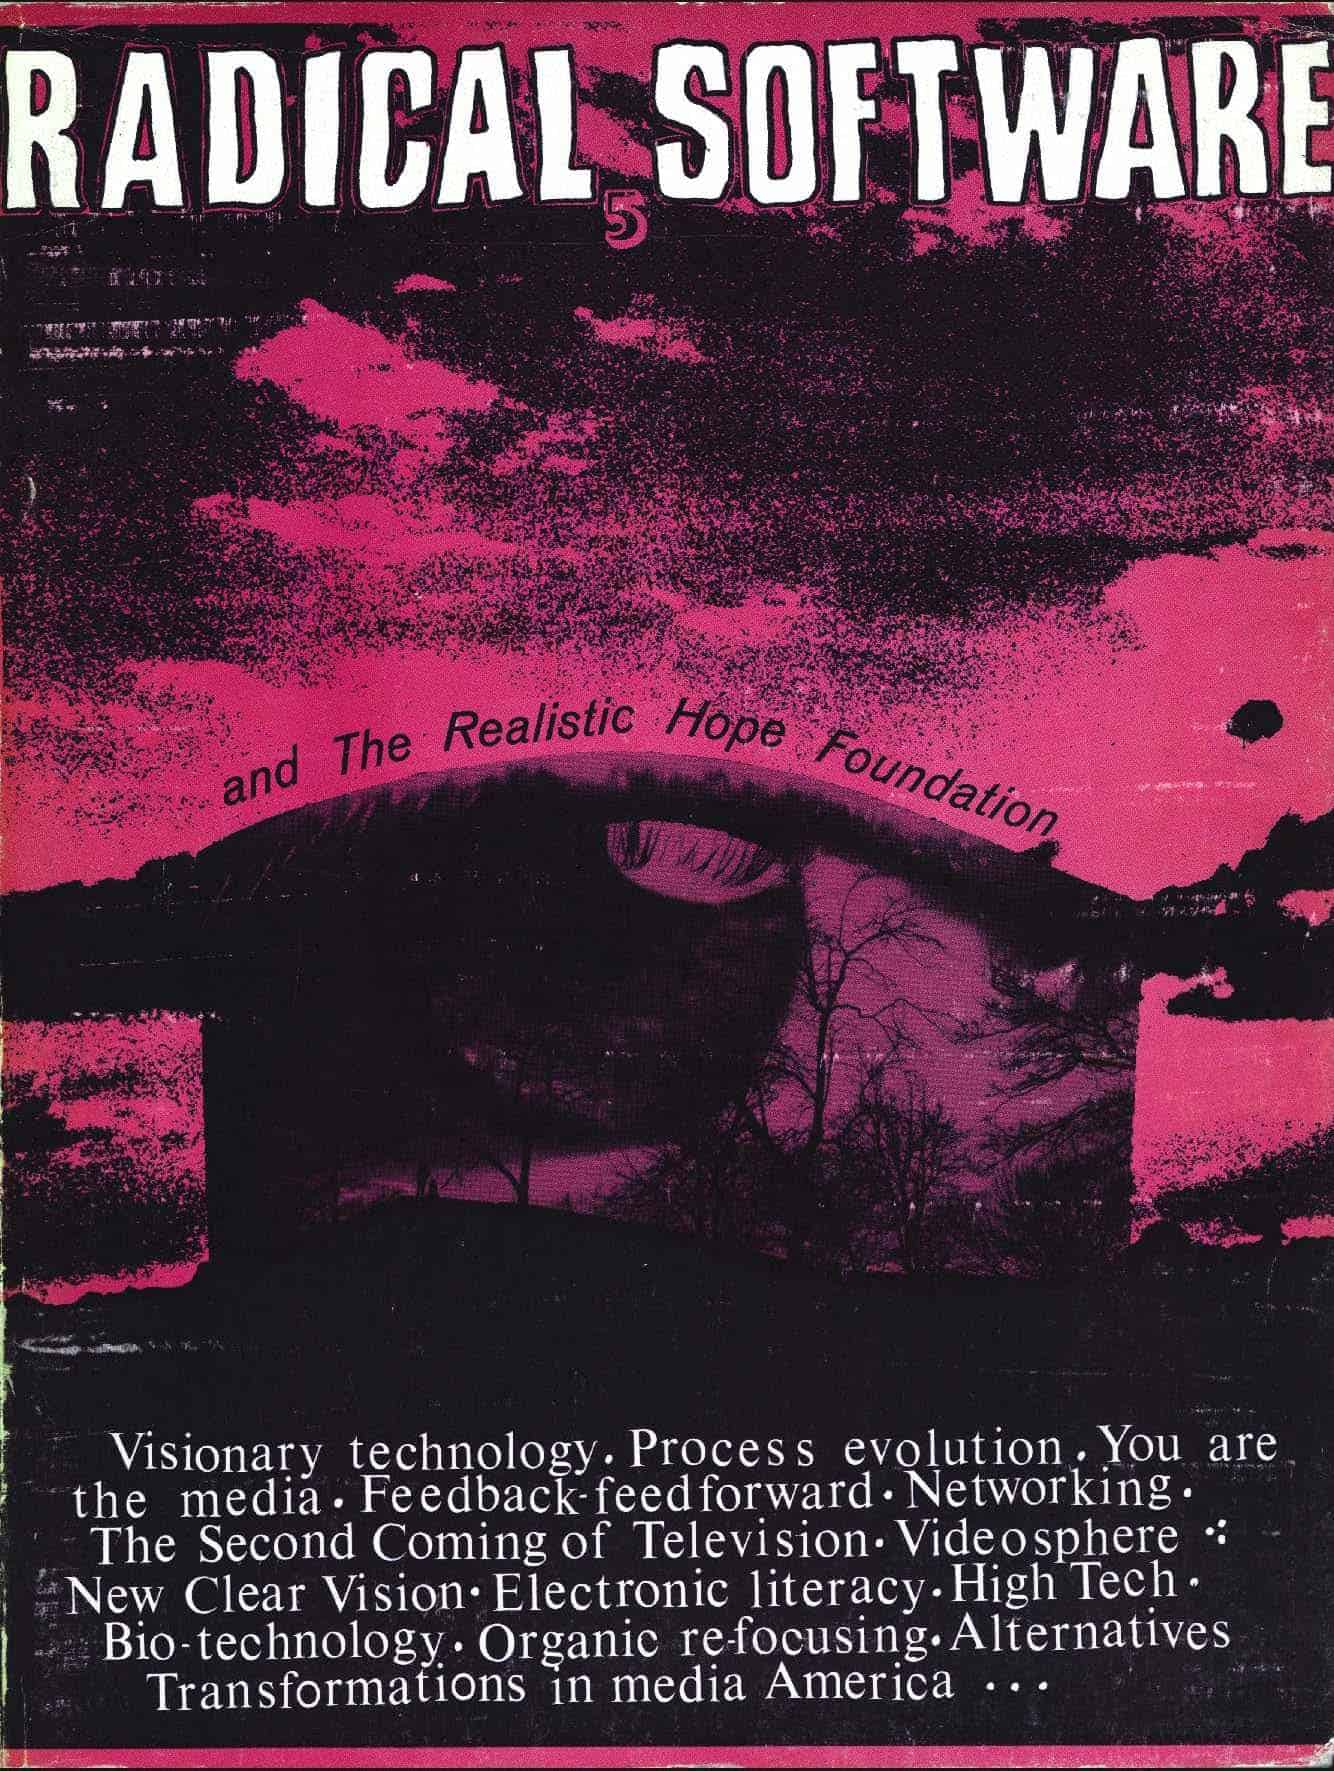 Copertina di  «Radical Software», Anno I, n.5, 1972.